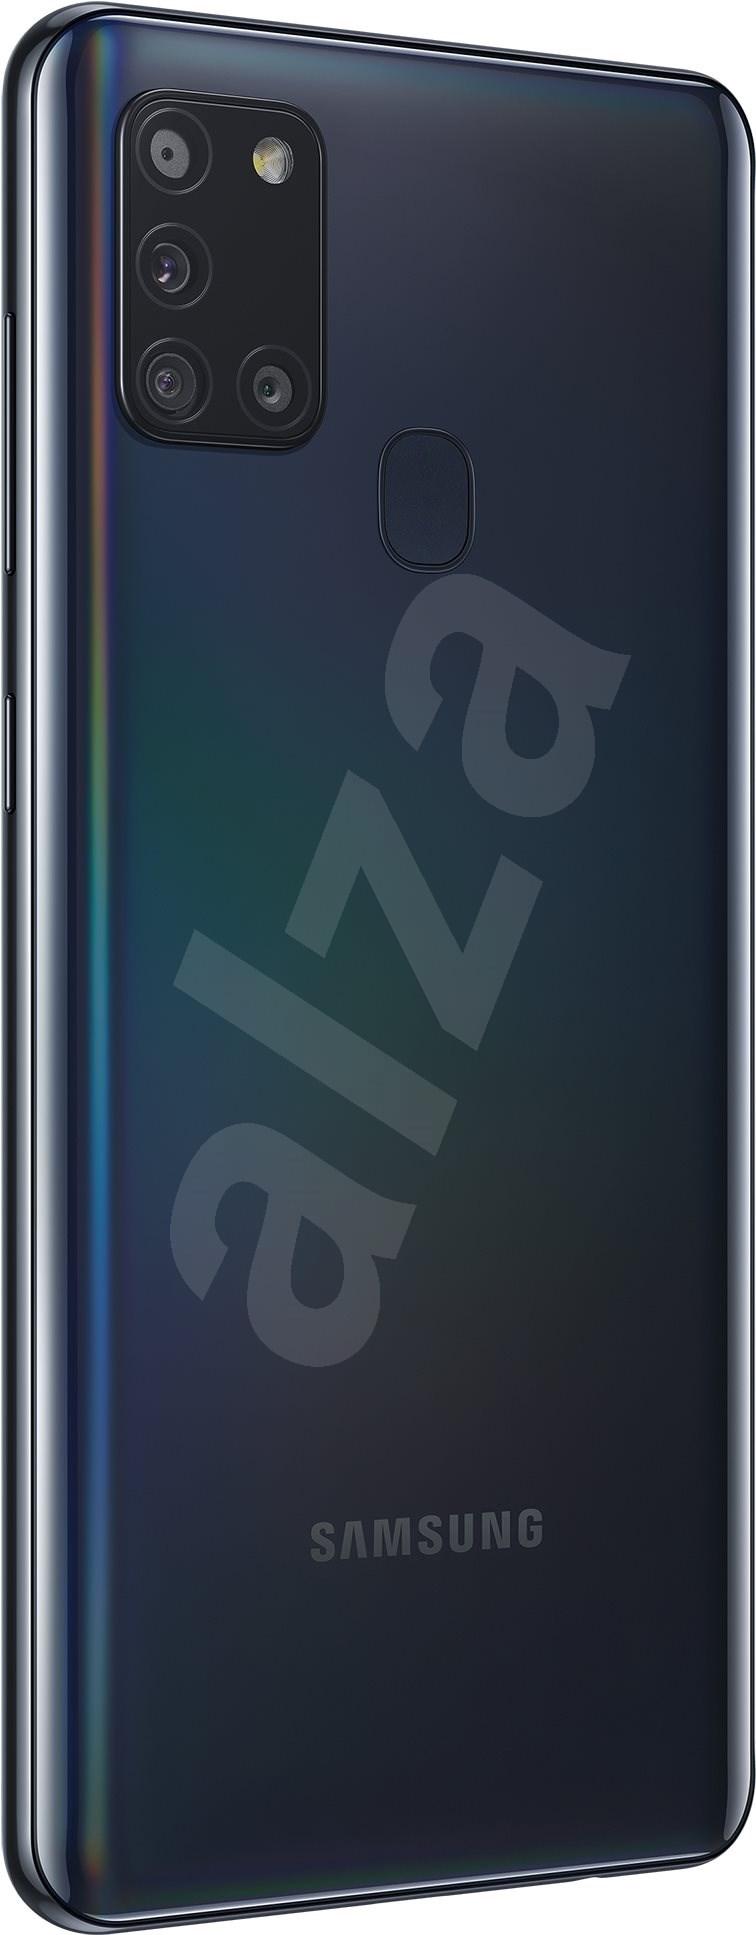 Samsung Galaxy A21s 32 GB fekete - Mobiltelefon